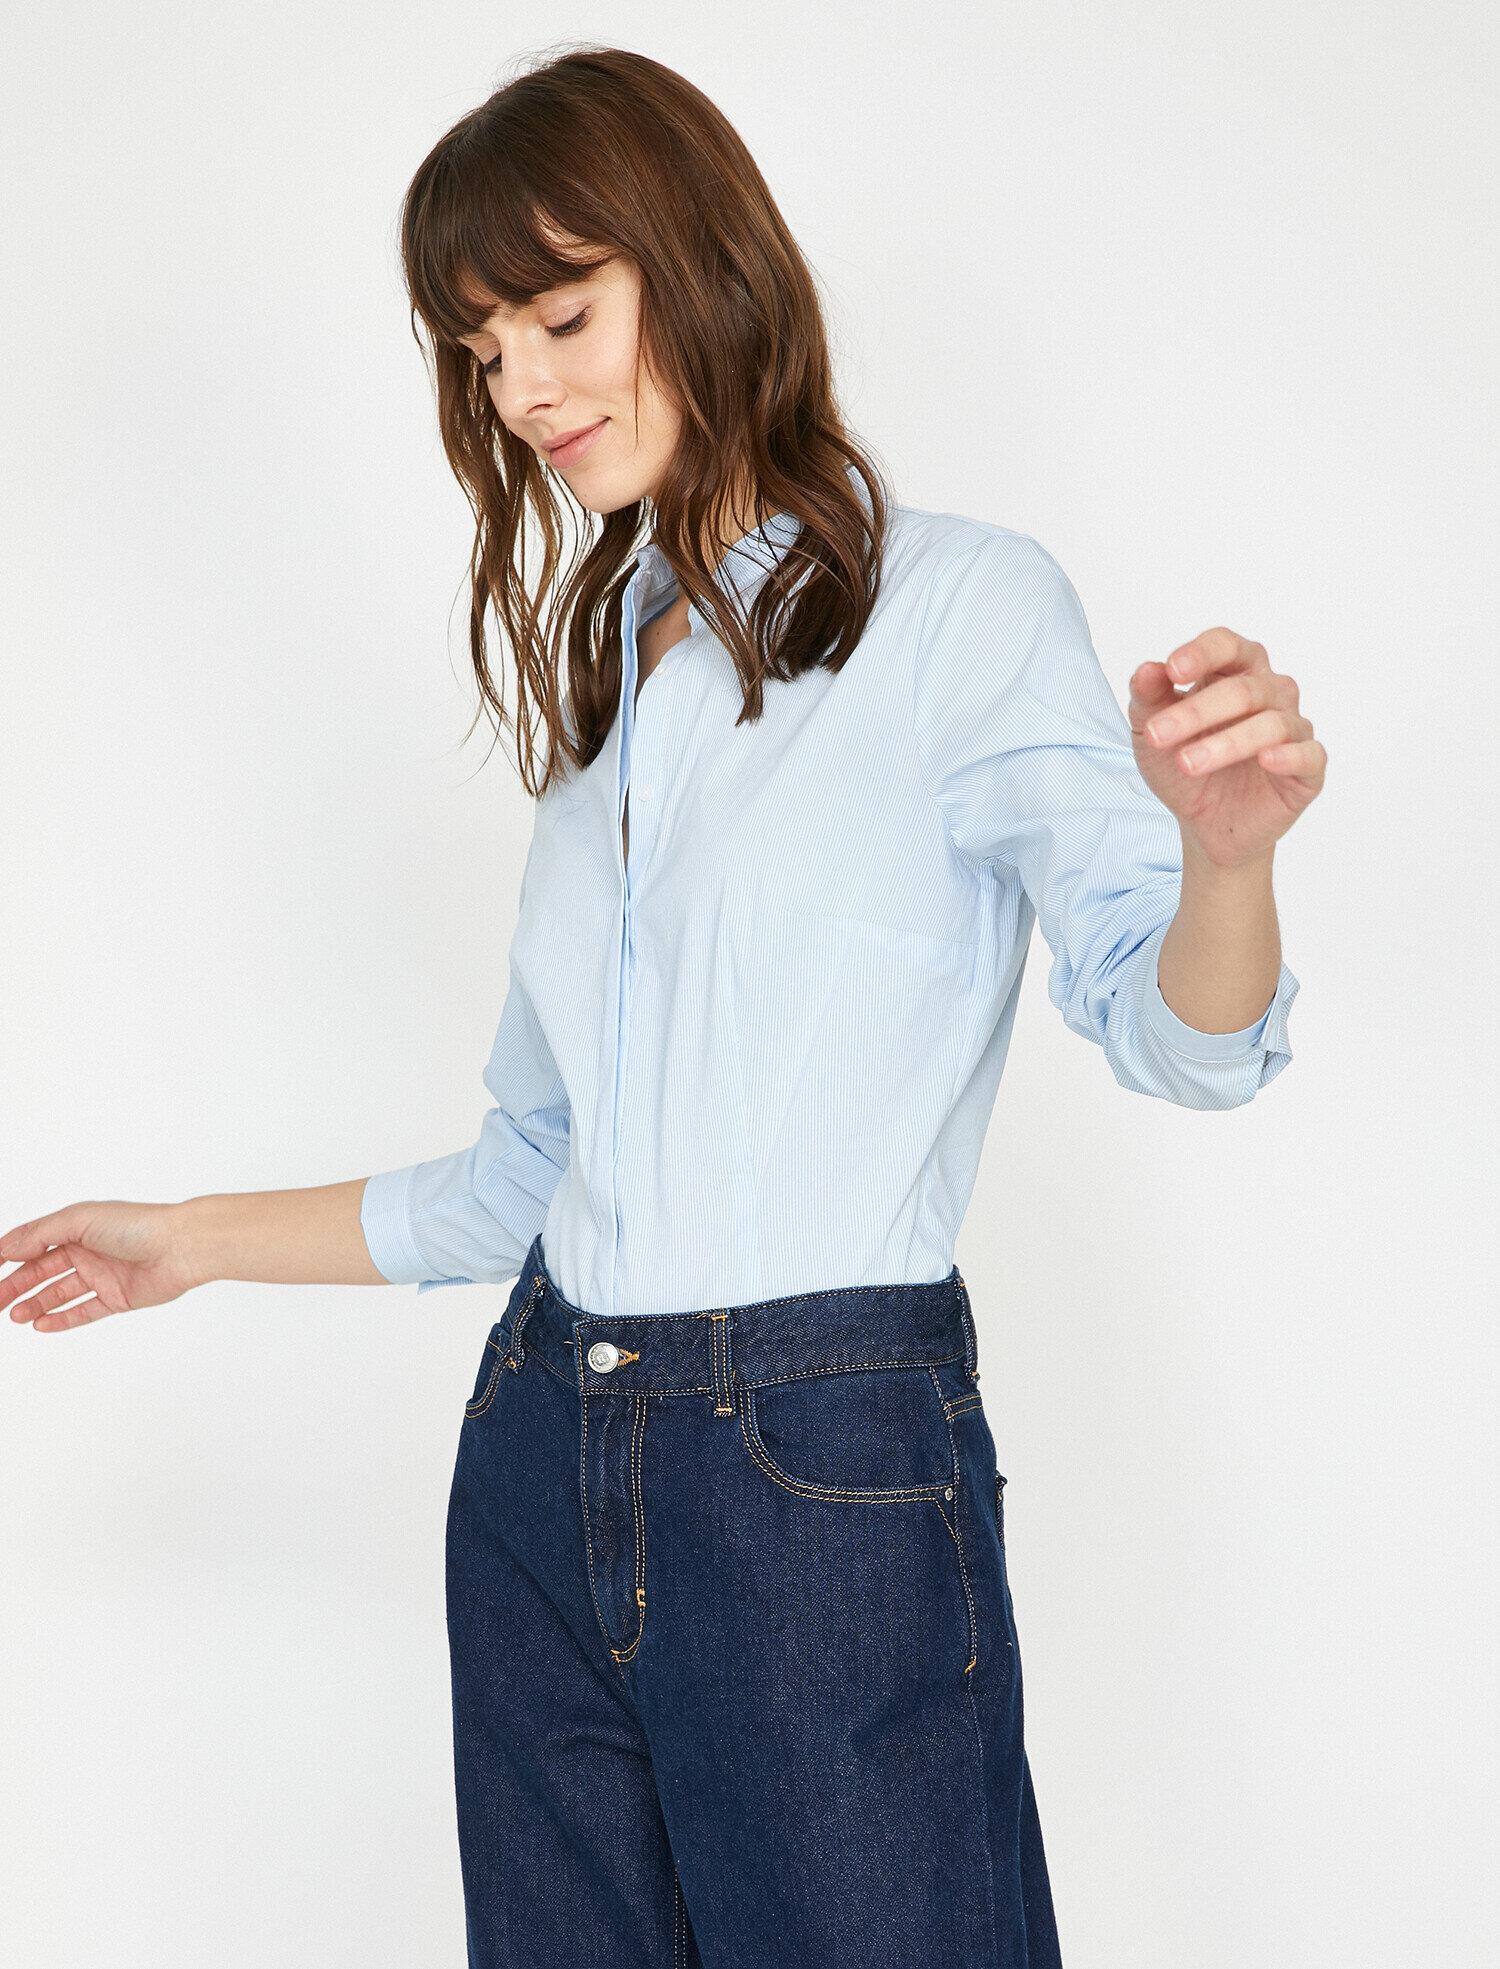 bdd28eca1f Blue Striped Women Mandarin Collar Shirt 9YAK66570IW03N | Koton